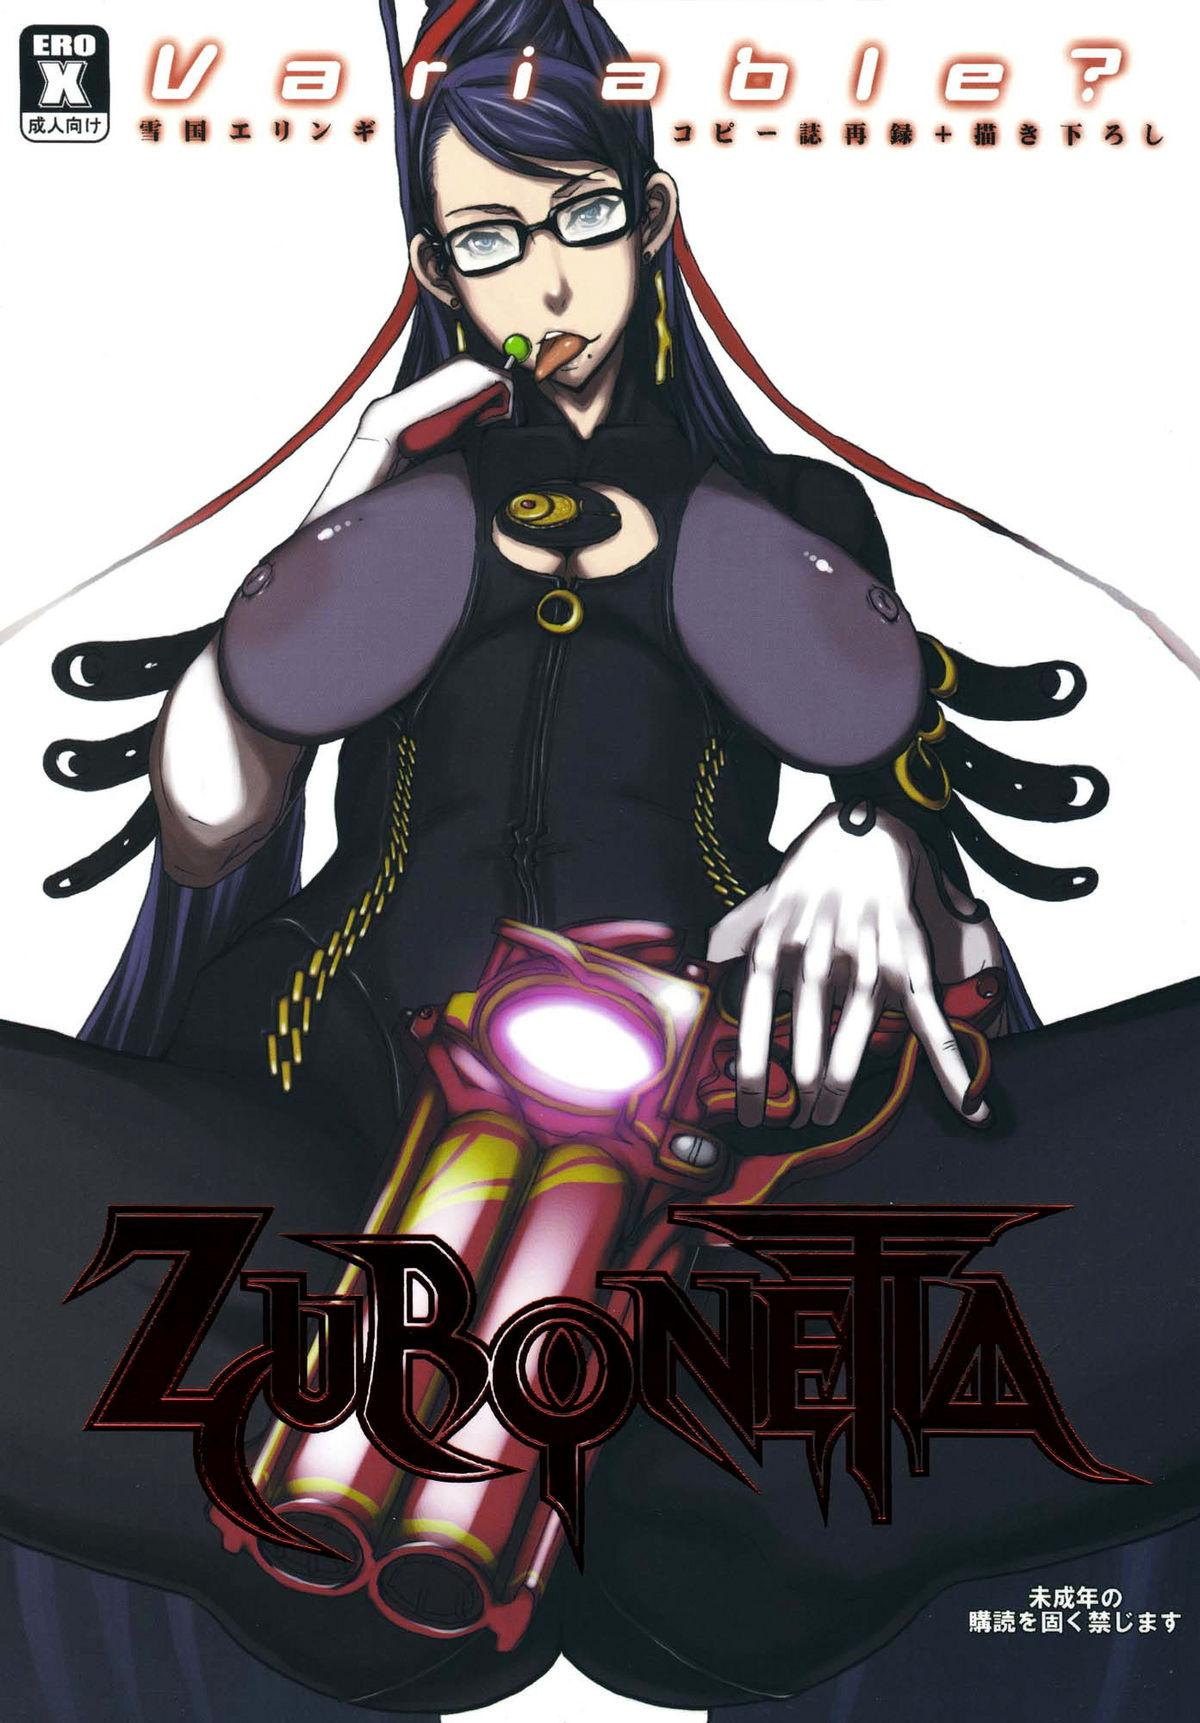 (C77) [VARIABLE? (Yukiguni Eringi)} Zurinetta (Various) 0